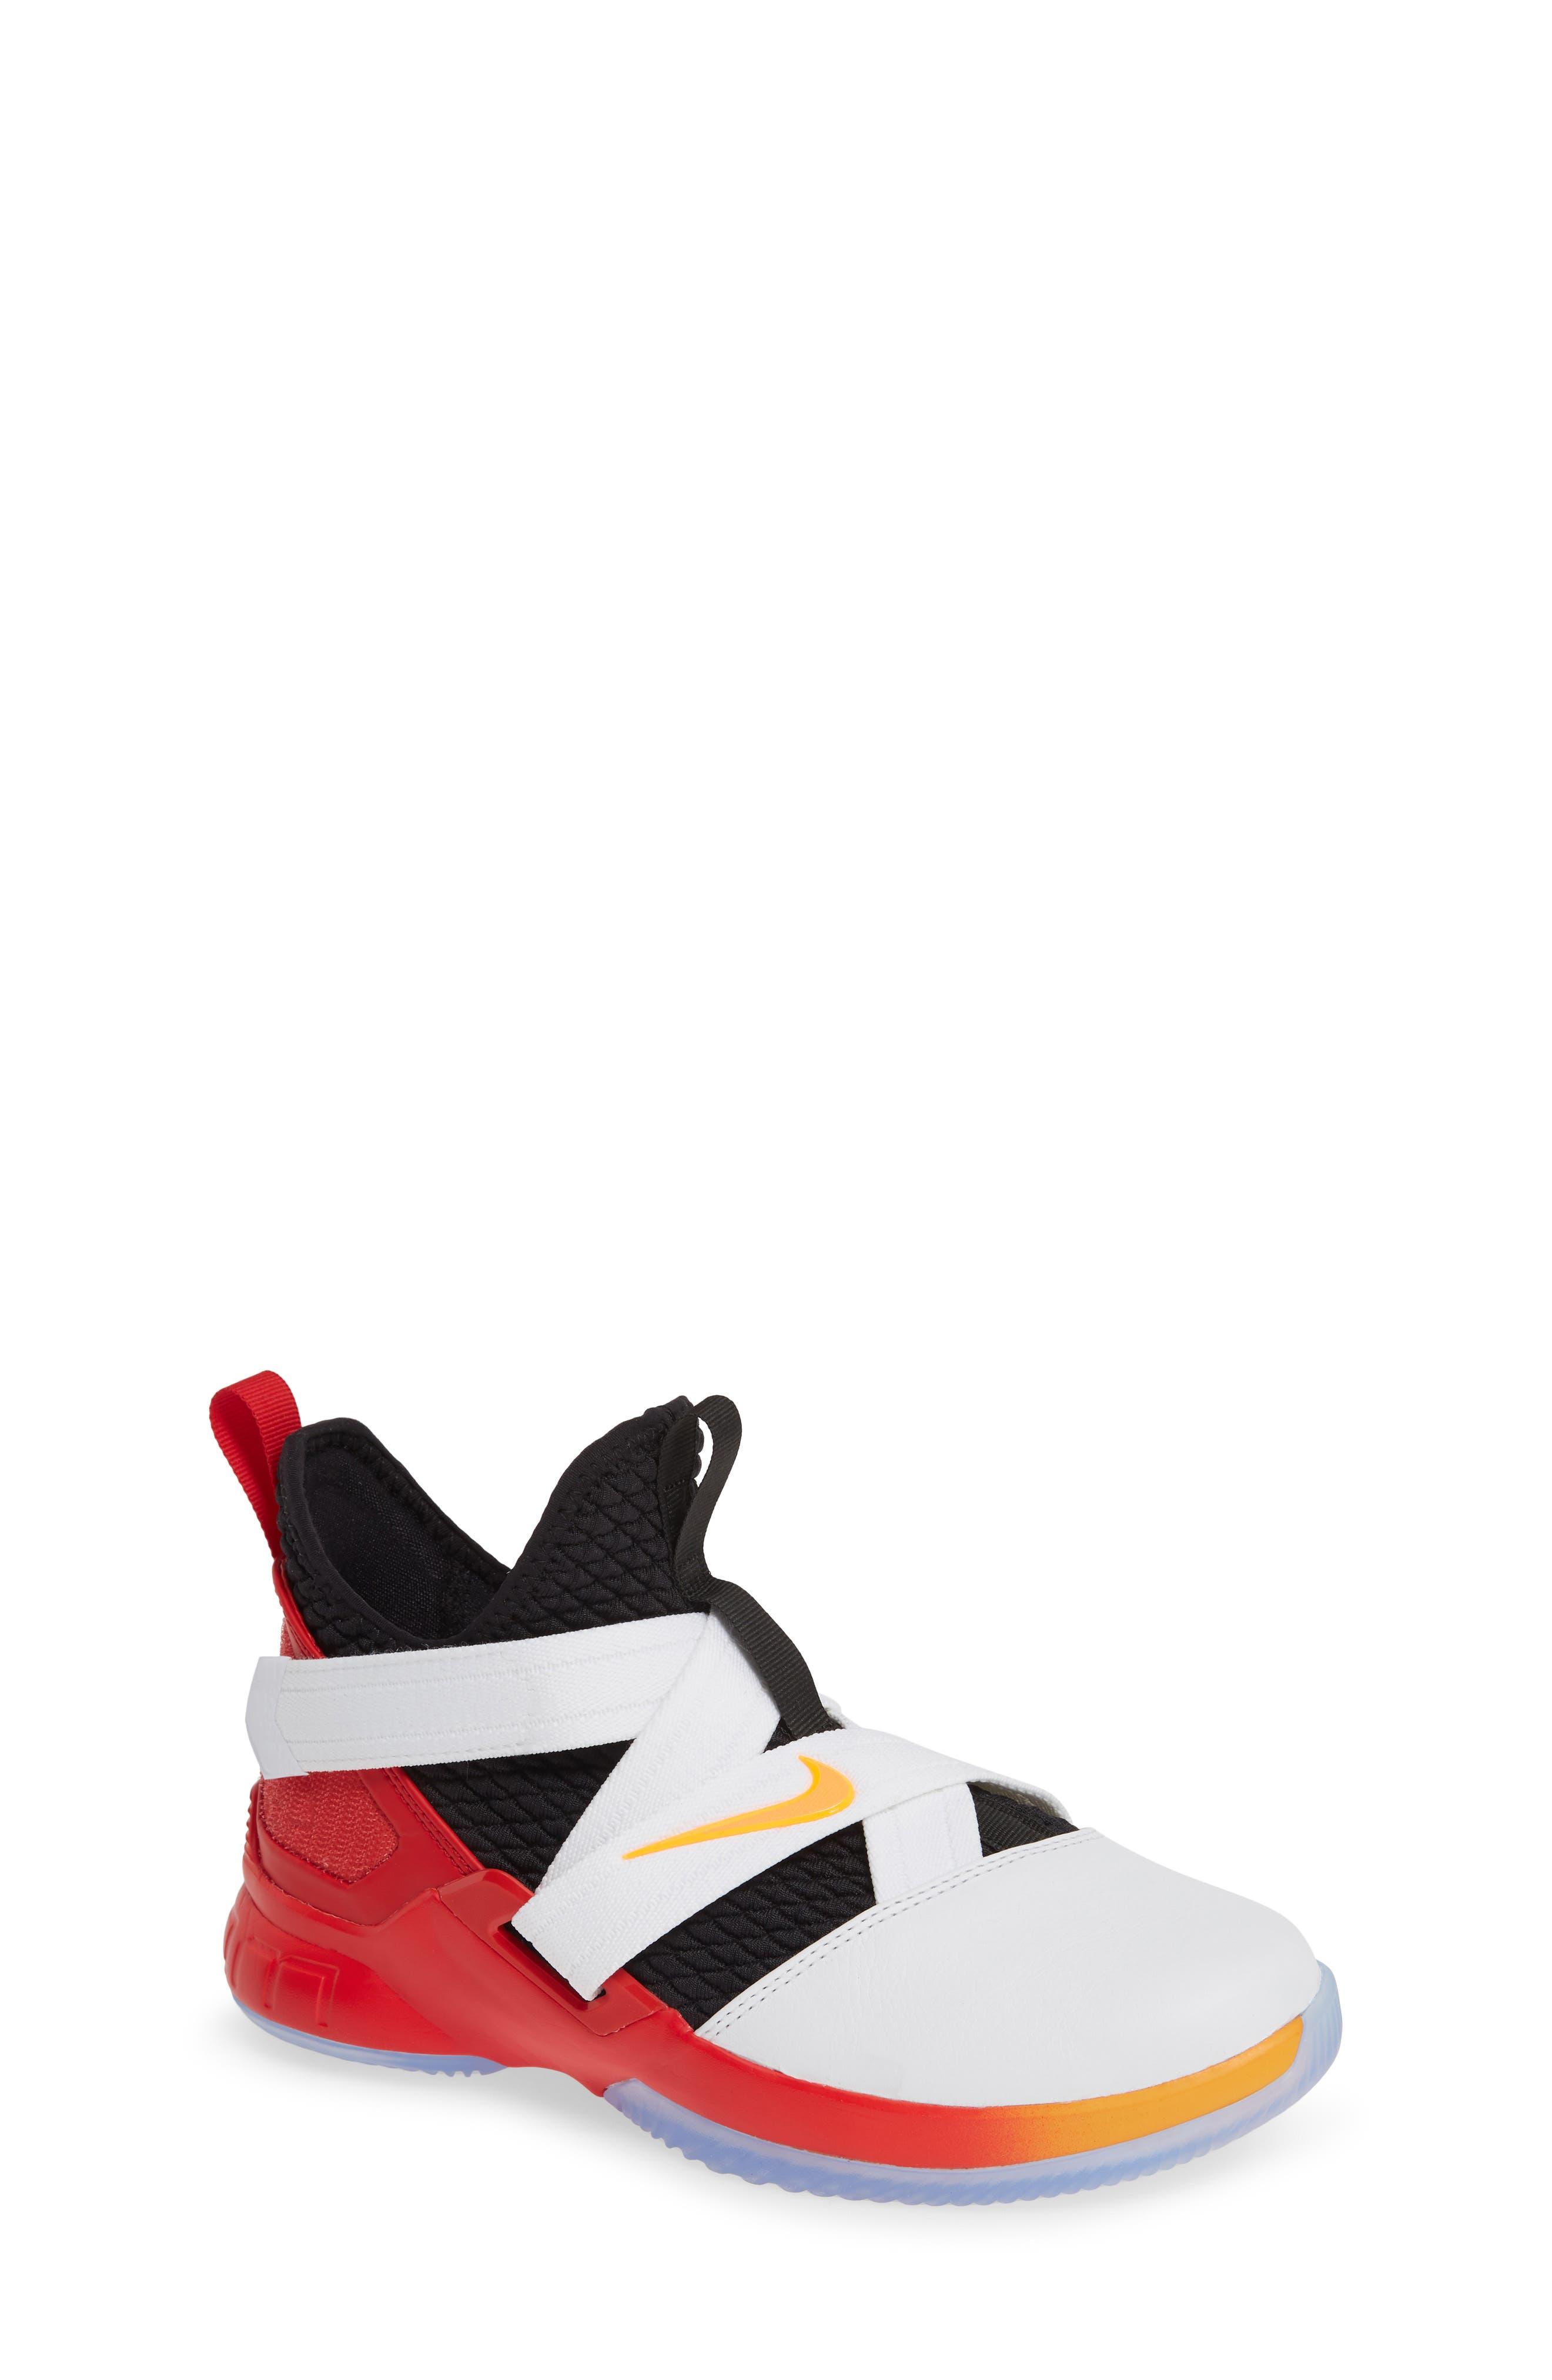 NIKE LeBron Soldier XII Basketball Shoe, Main, color, WHITE/ LASER ORANGE-BLACK-RED